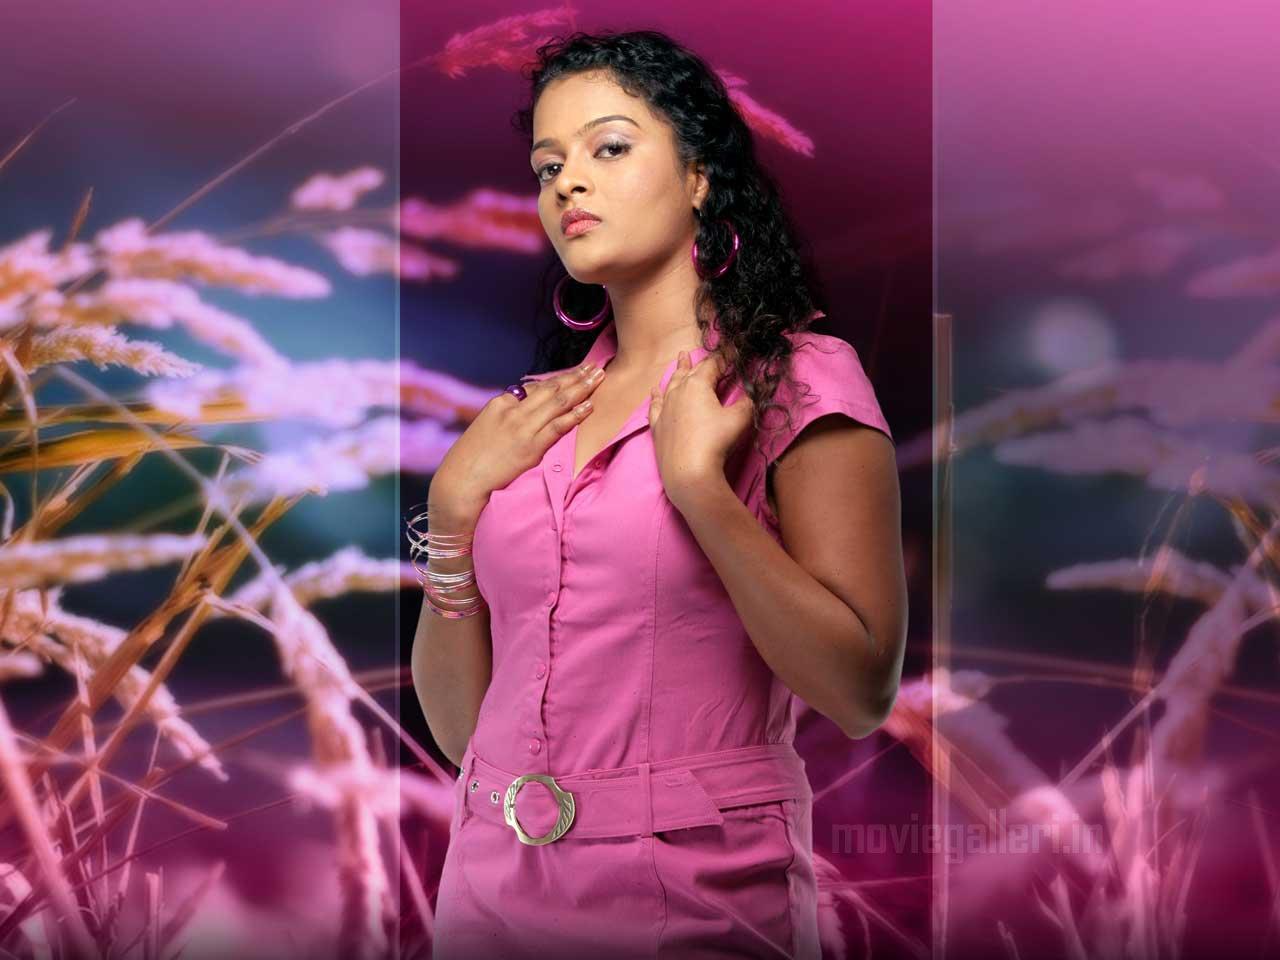 Actress Sonia Deepthi Wallpapers | GPict